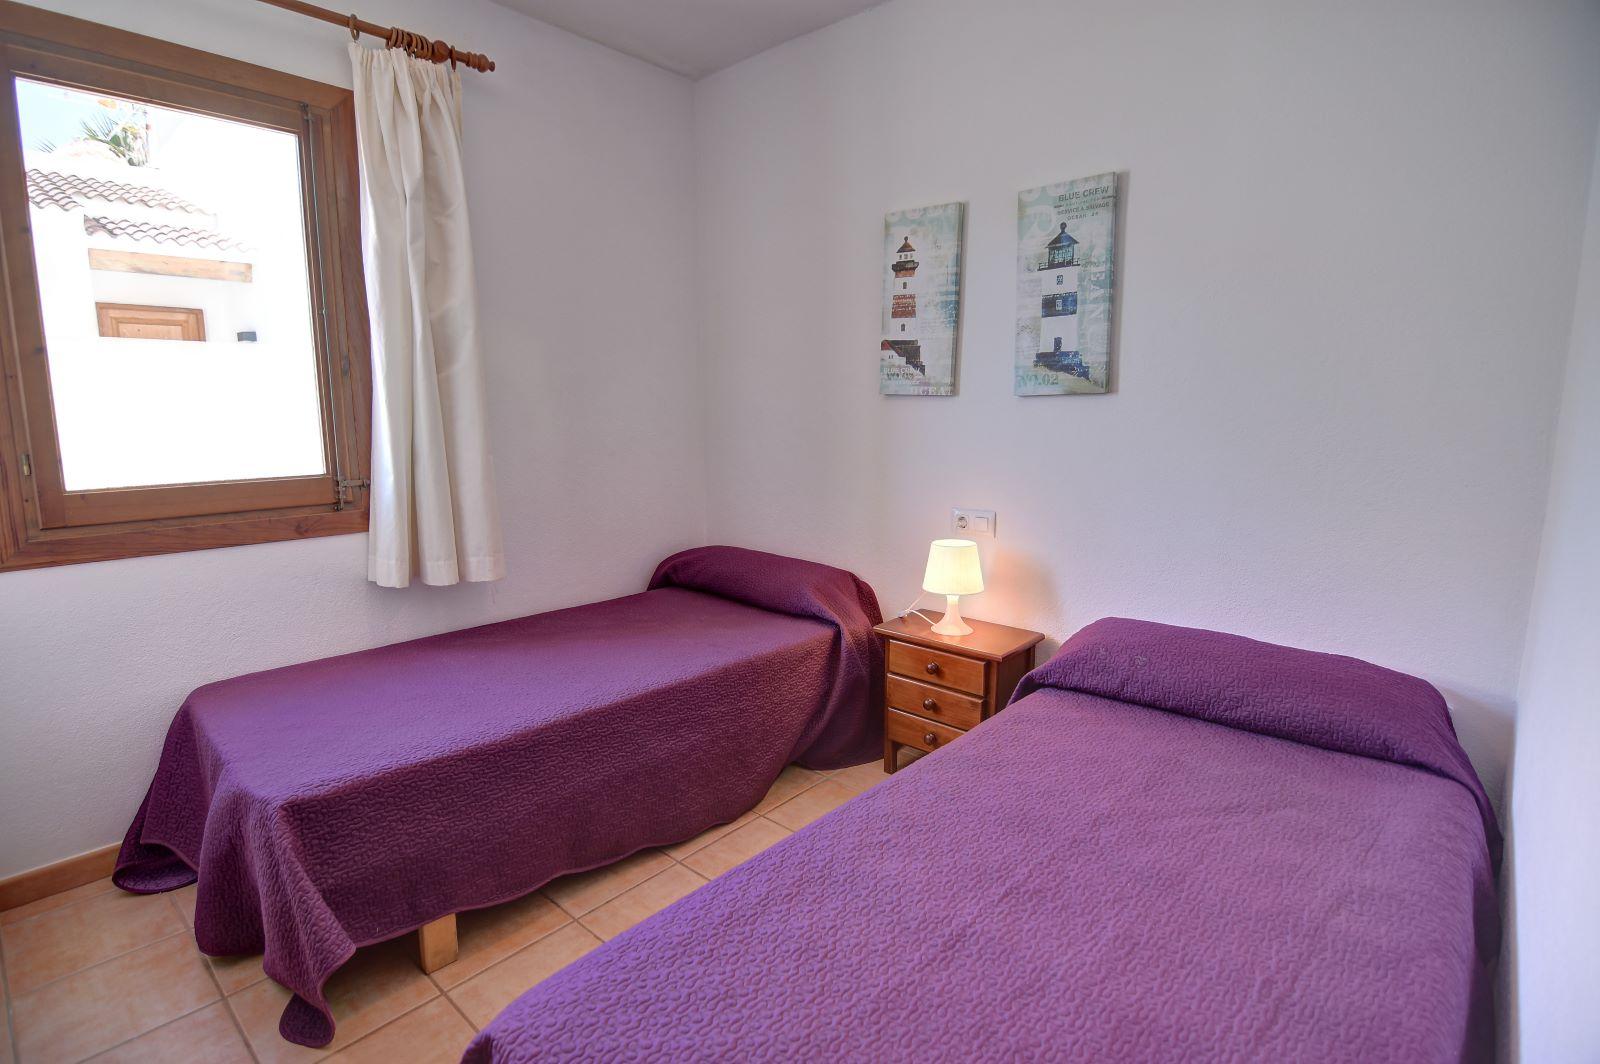 Villa in Cap D'Artruitx Ref: H2589 10